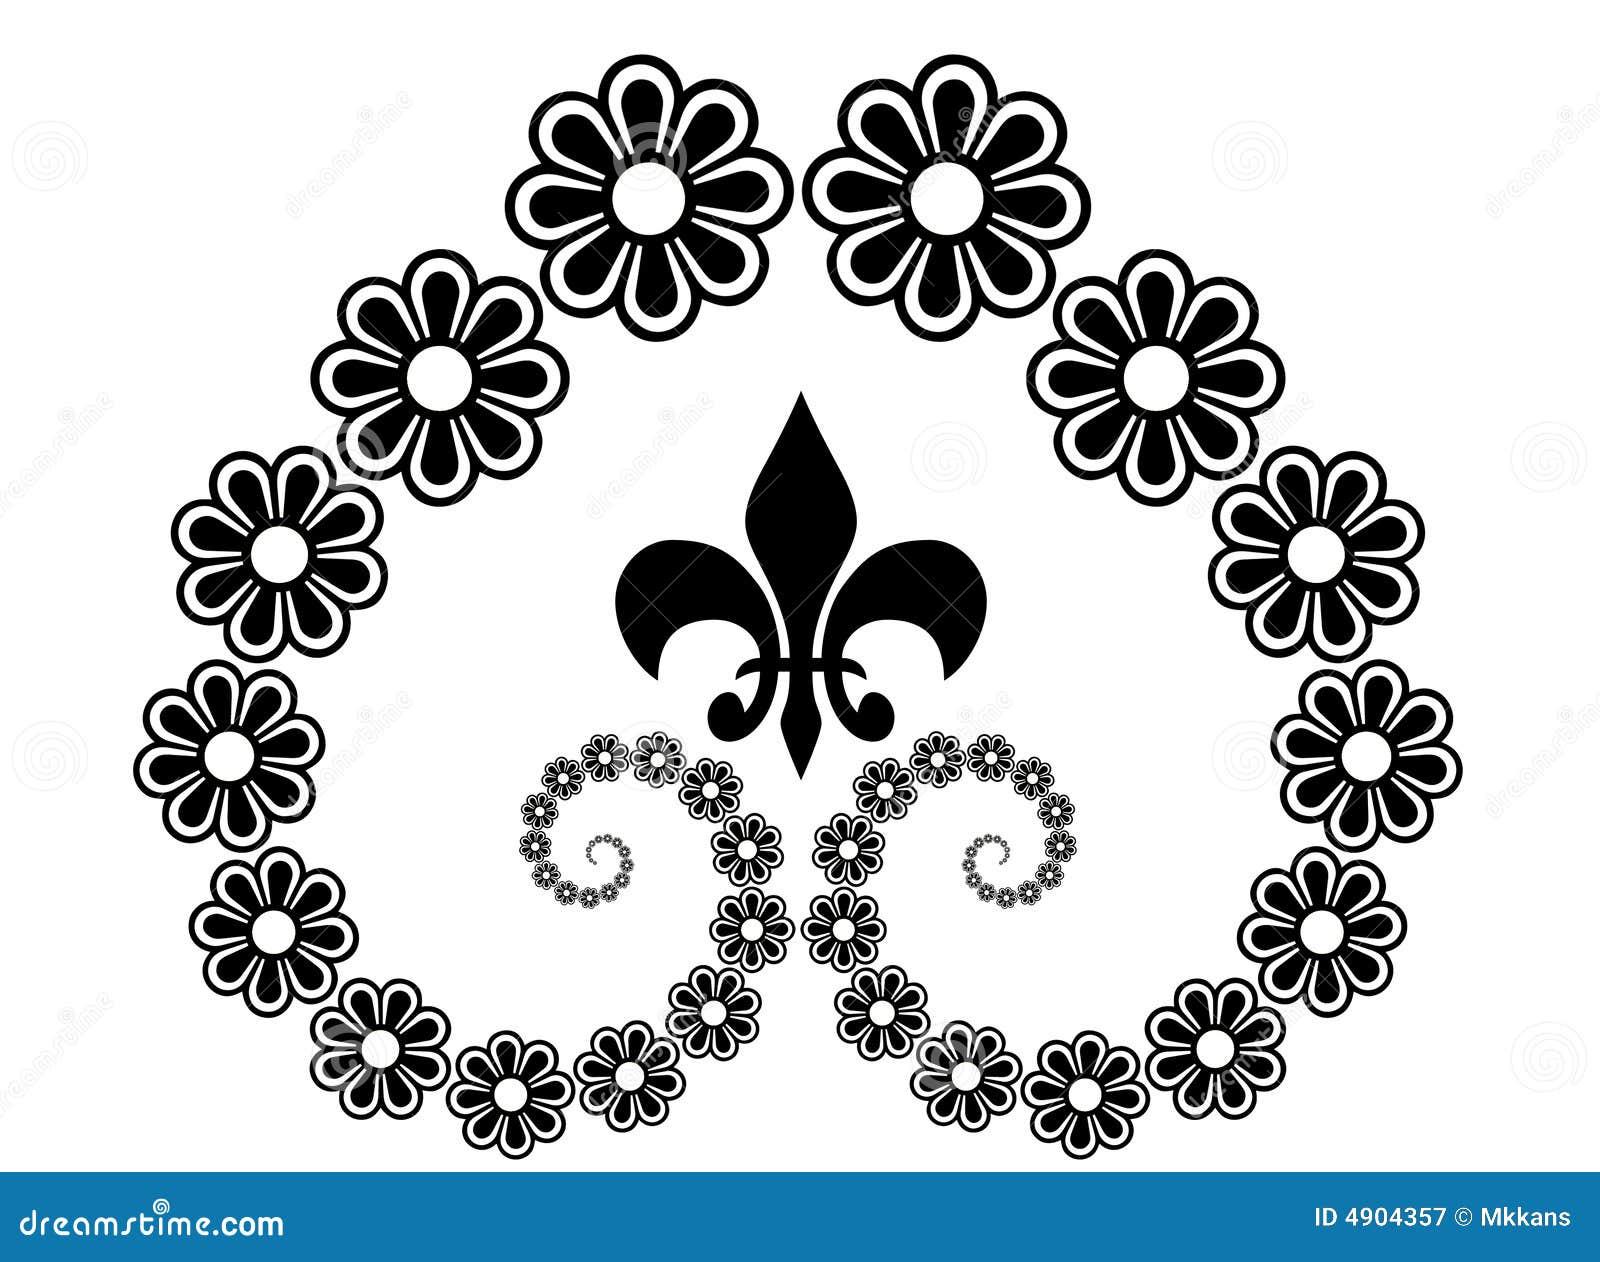 Line Art Design Free Download : Flower line art stock illustration of